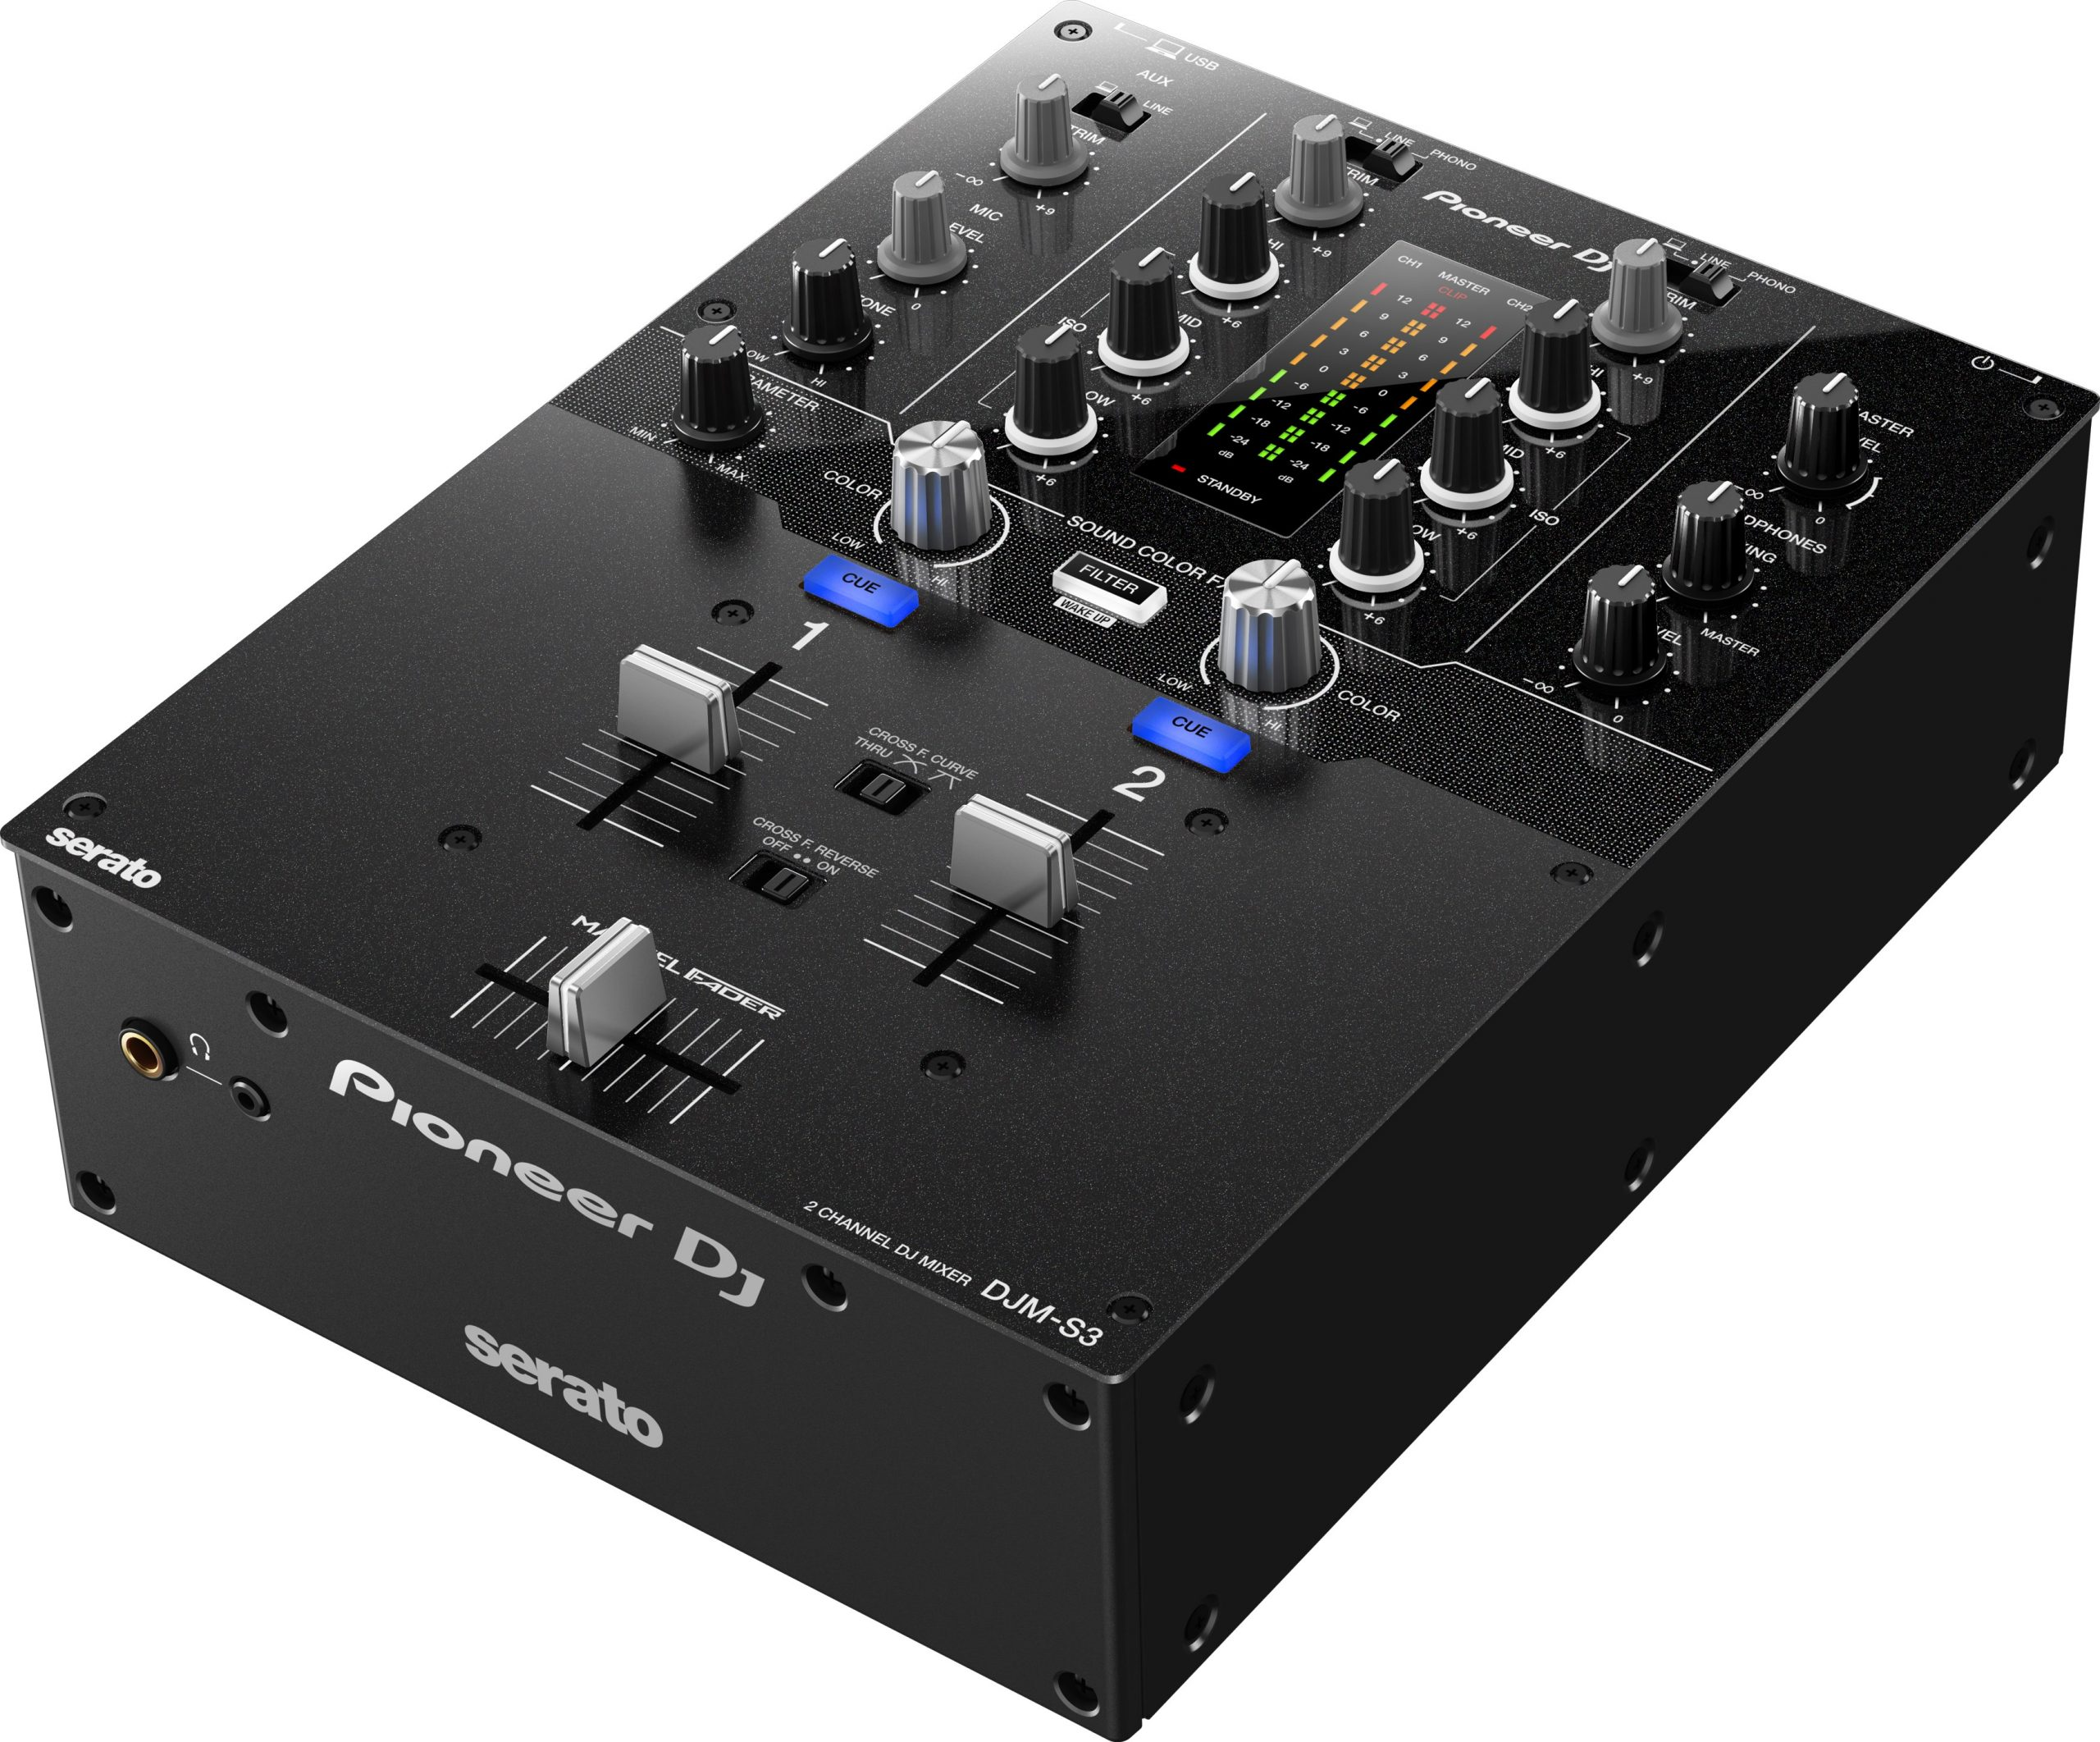 DJ DJM-S3 (2-channel mixer for Serato DJ Pro)